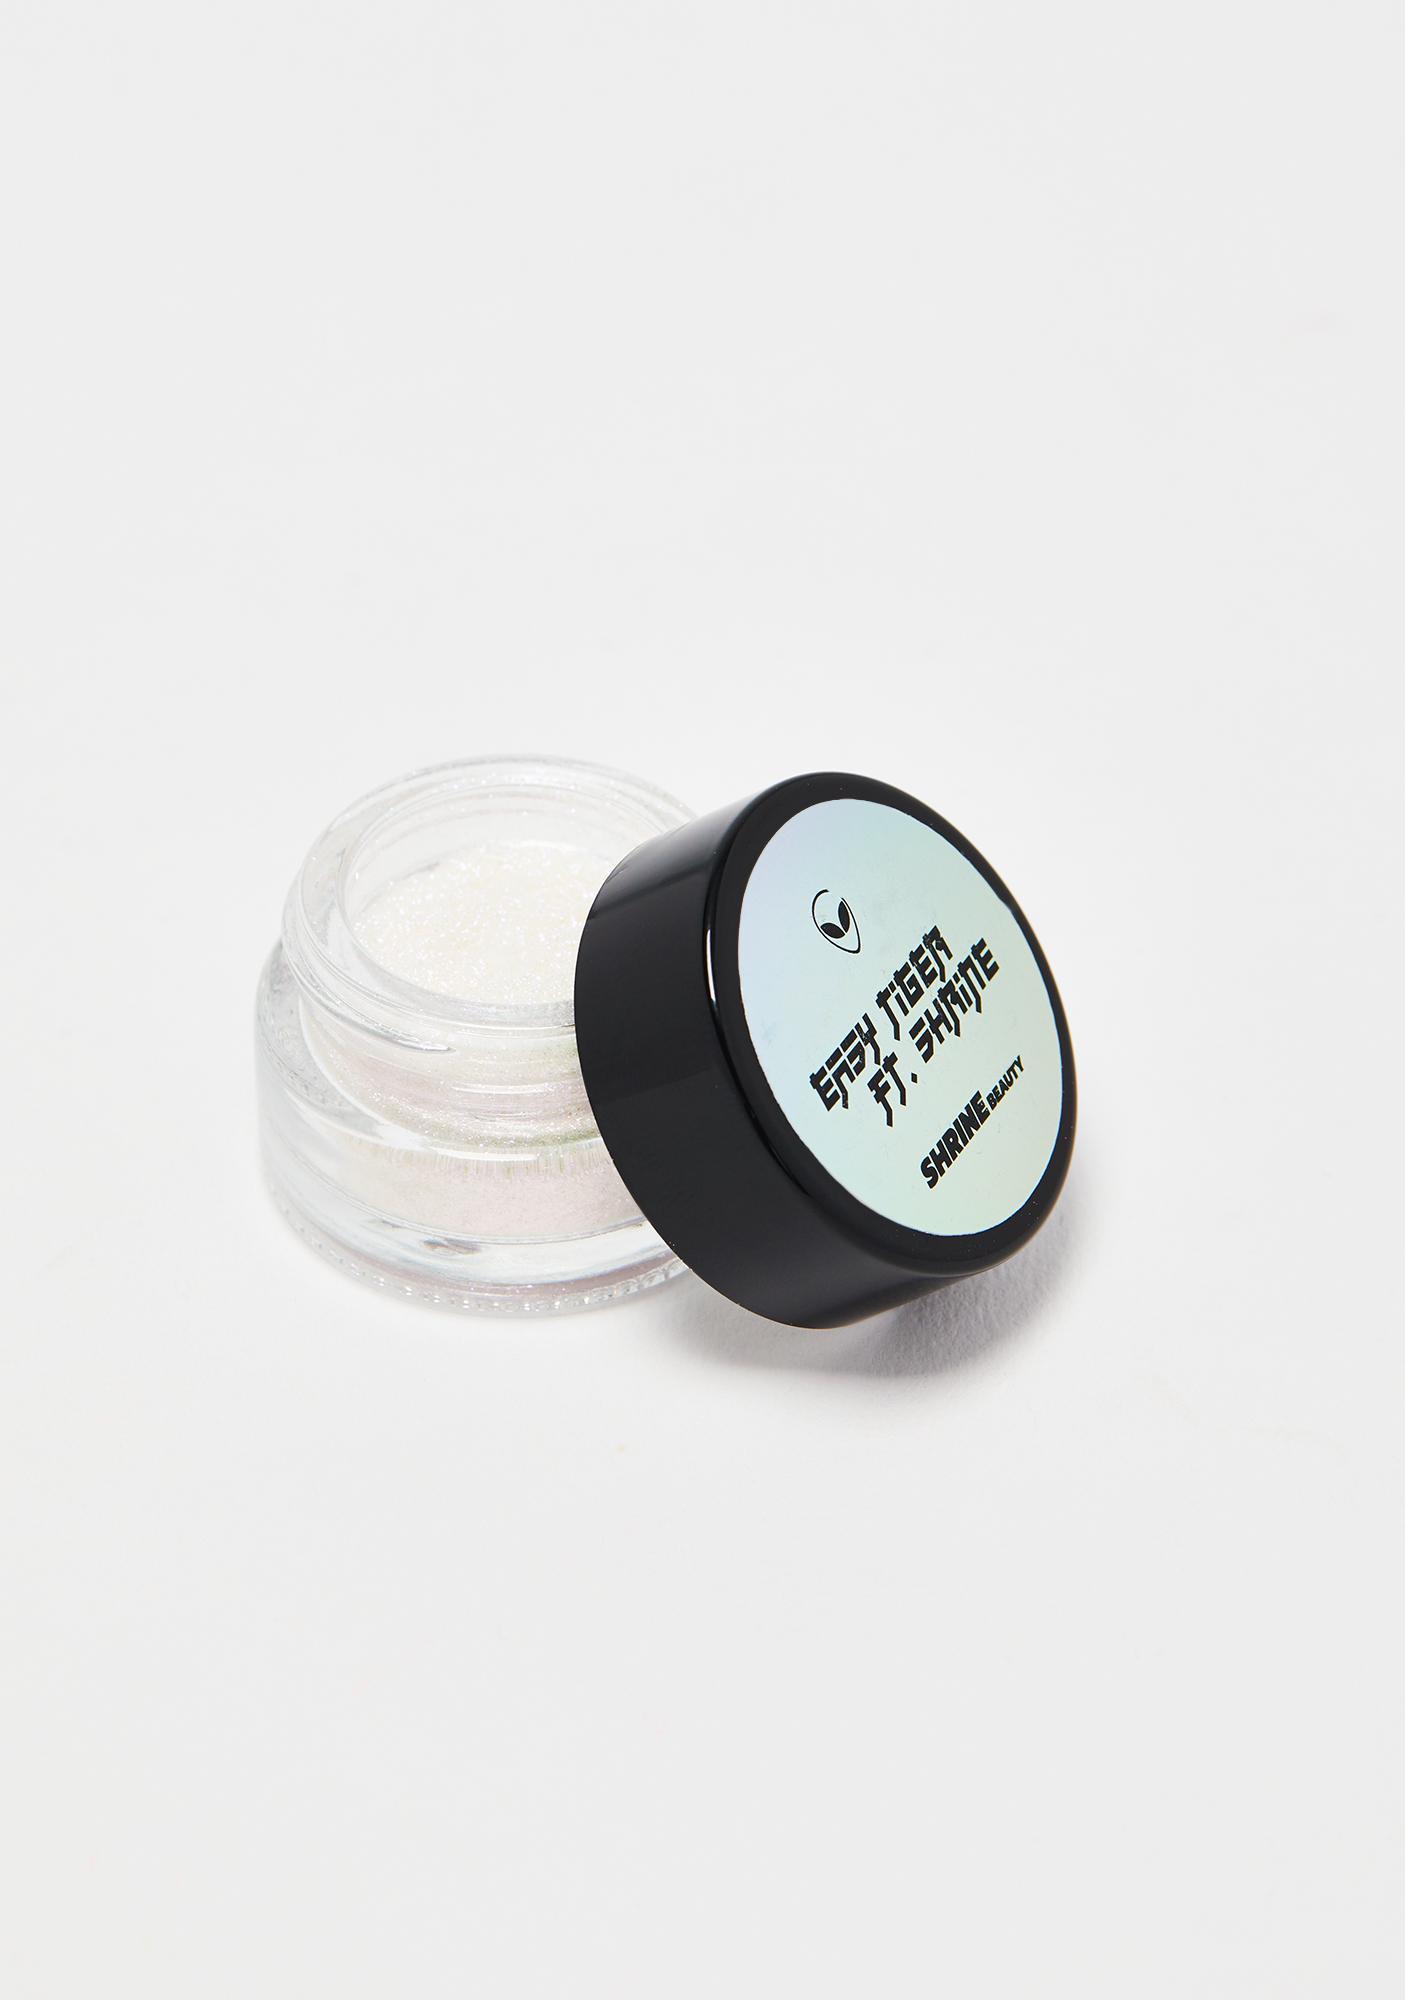 SHRINE Solstice Glitter Pigment